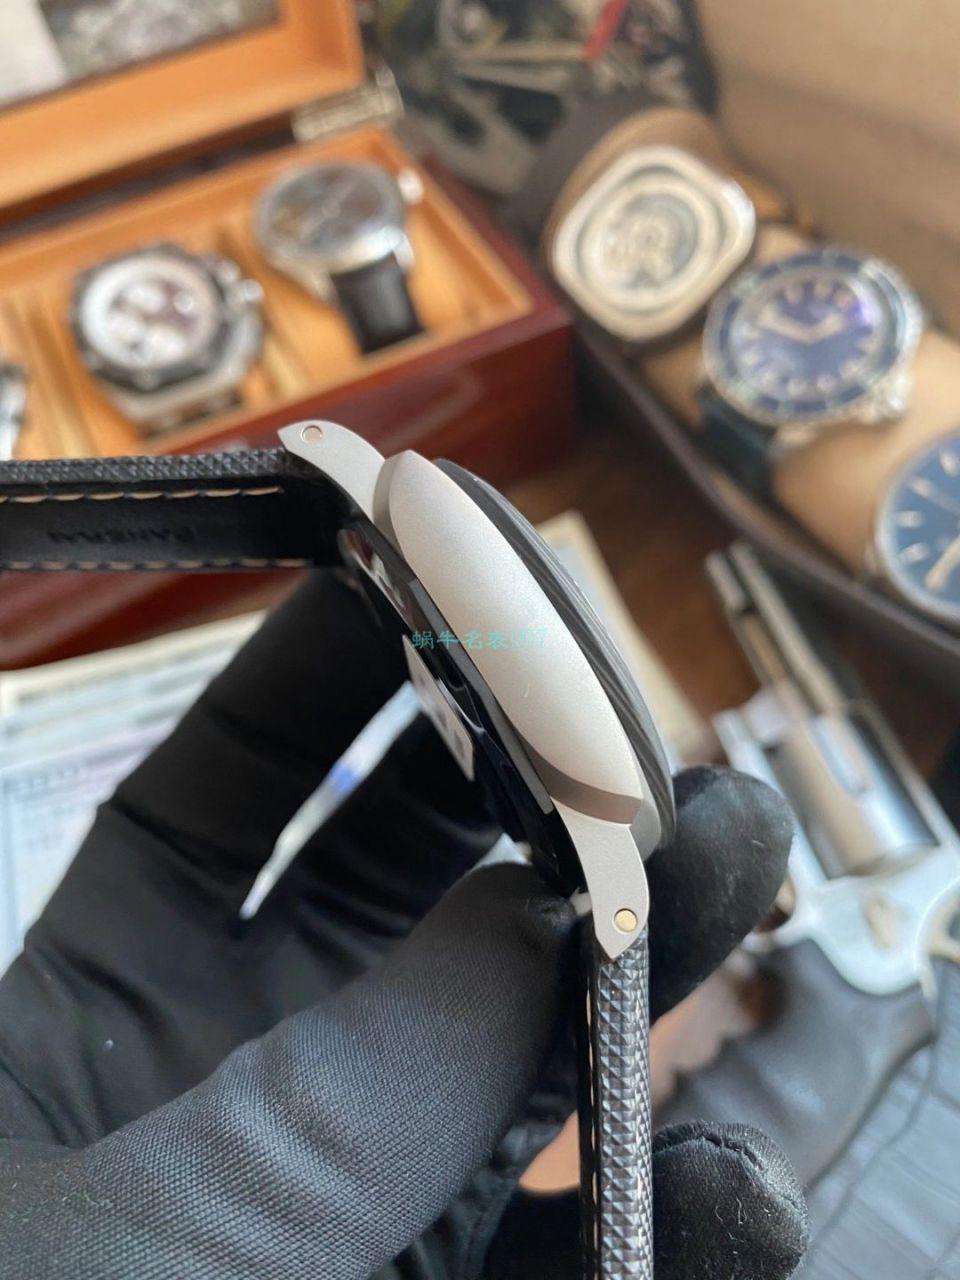 VS厂沛纳海LUMINOR 1比1超A高仿手表PAM01662烟灰腕表 / VSPAM1662